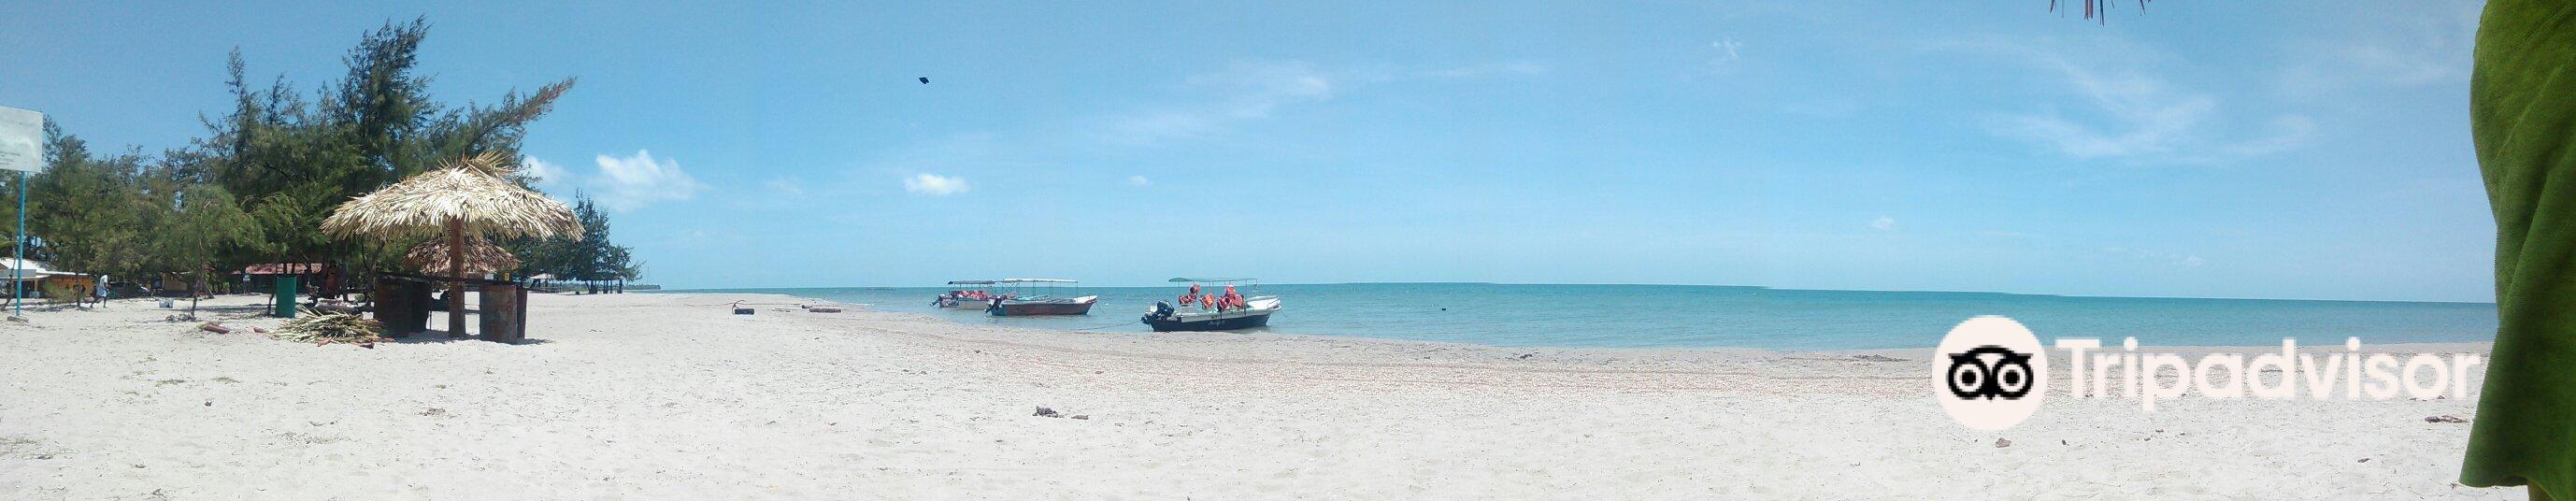 Casuarina Beach旅游景点图片